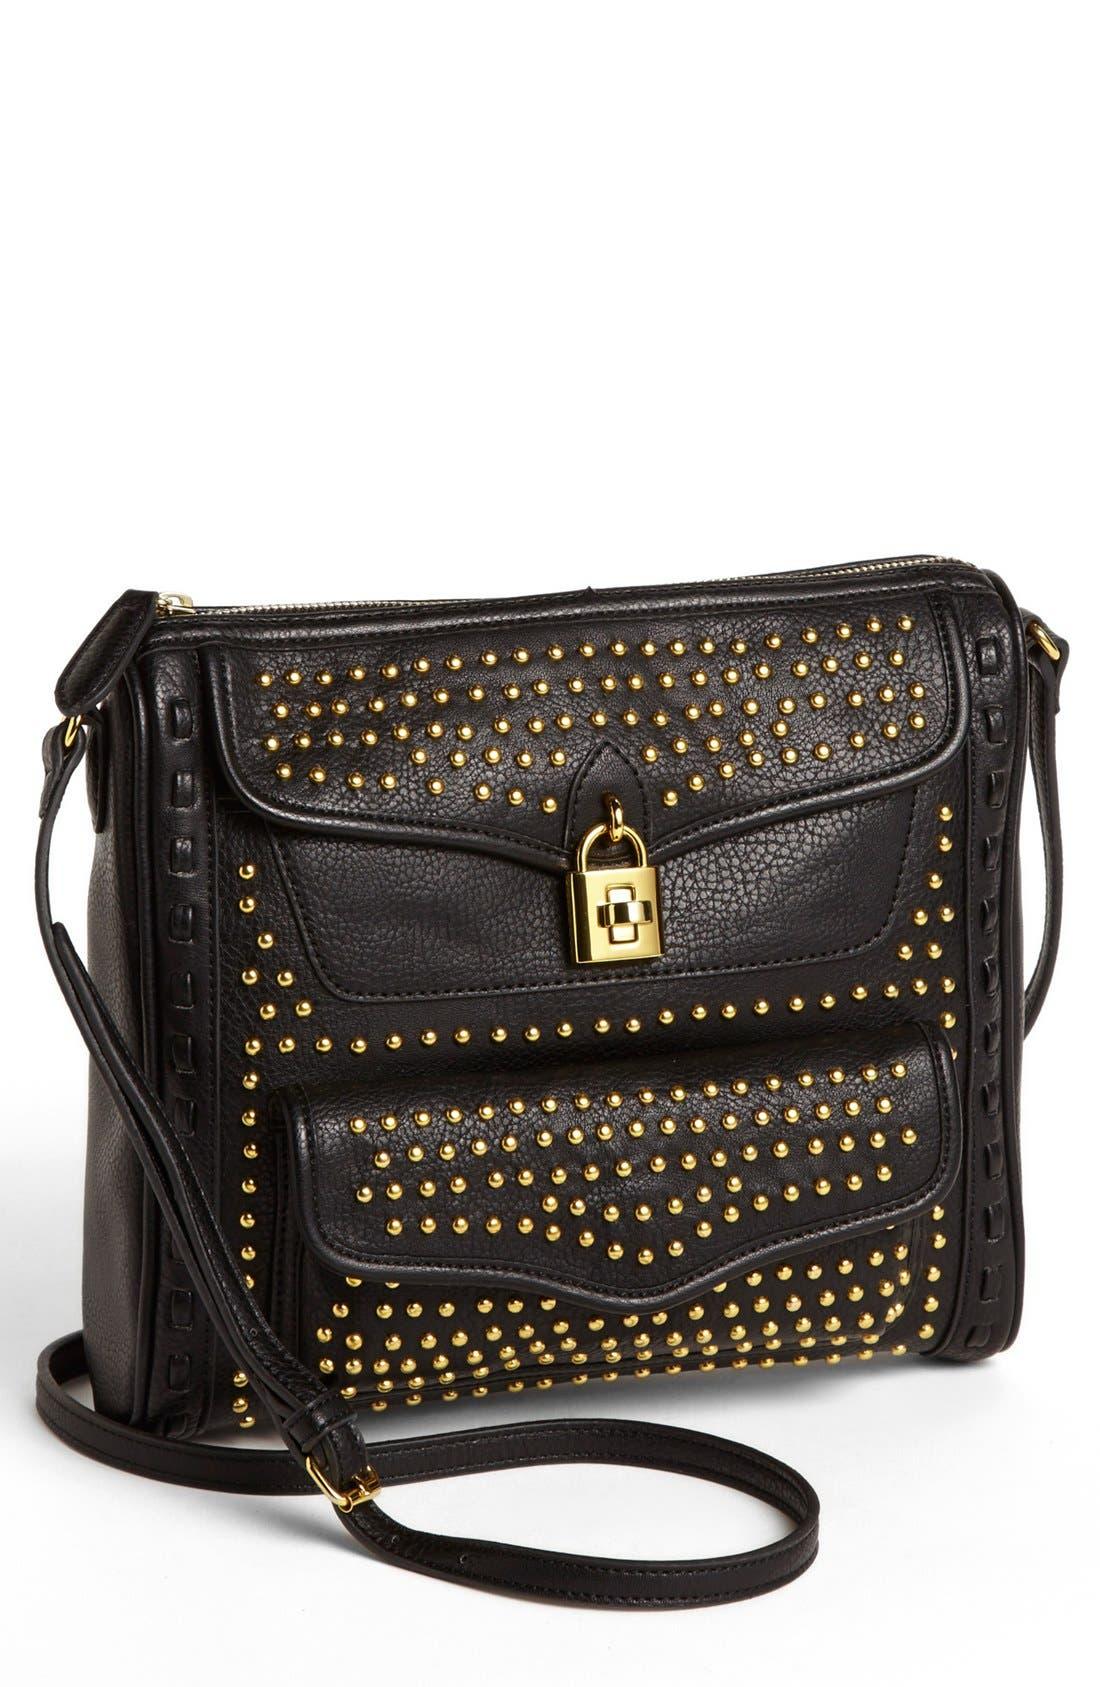 Main Image - Jessica Simpson 'Madison' Pebble Studded Crossbody Bag